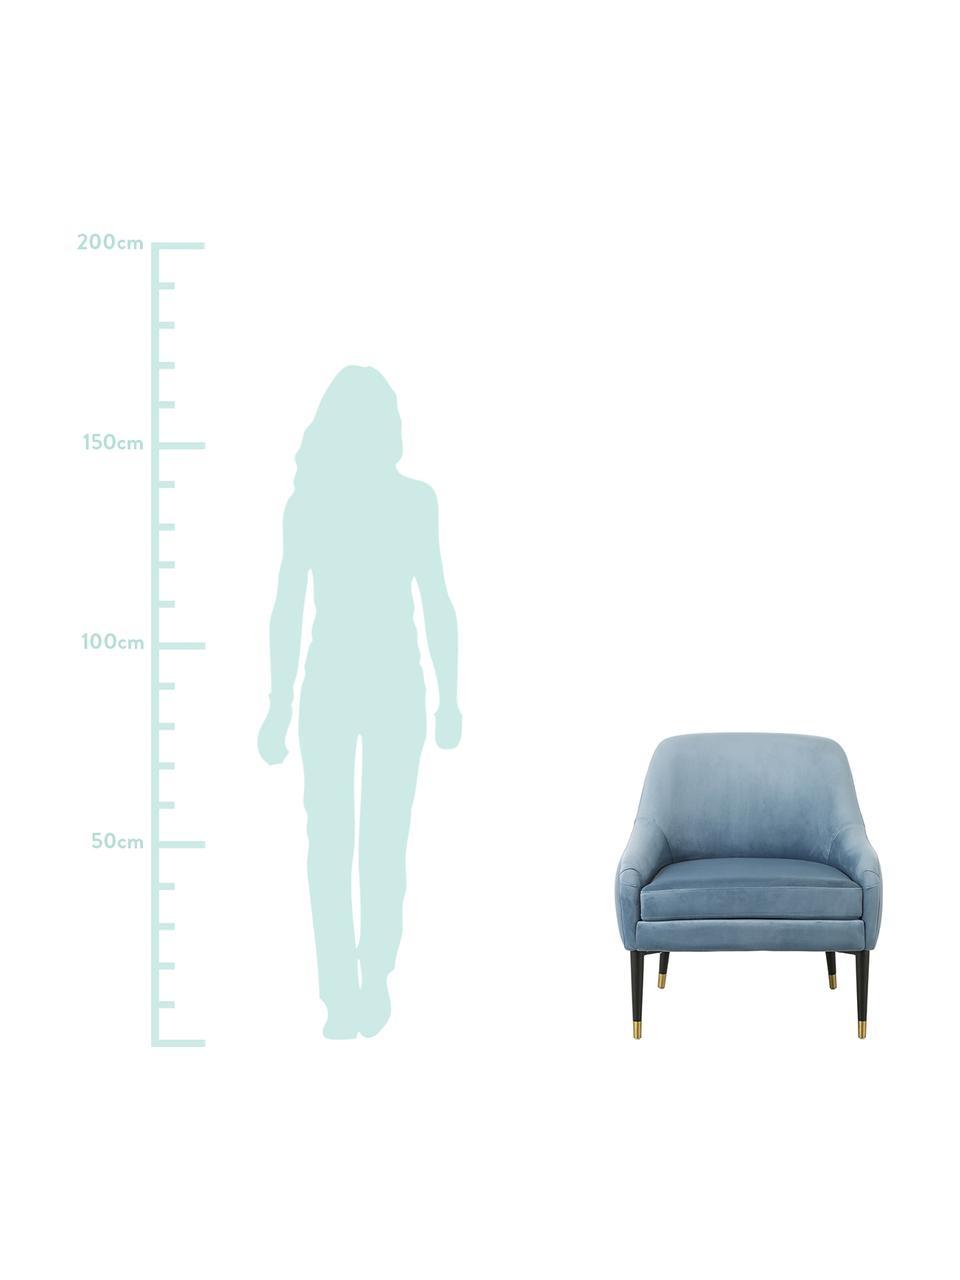 Fauteuil lounge en velours bleu Eugenia, Velours bleu ciel